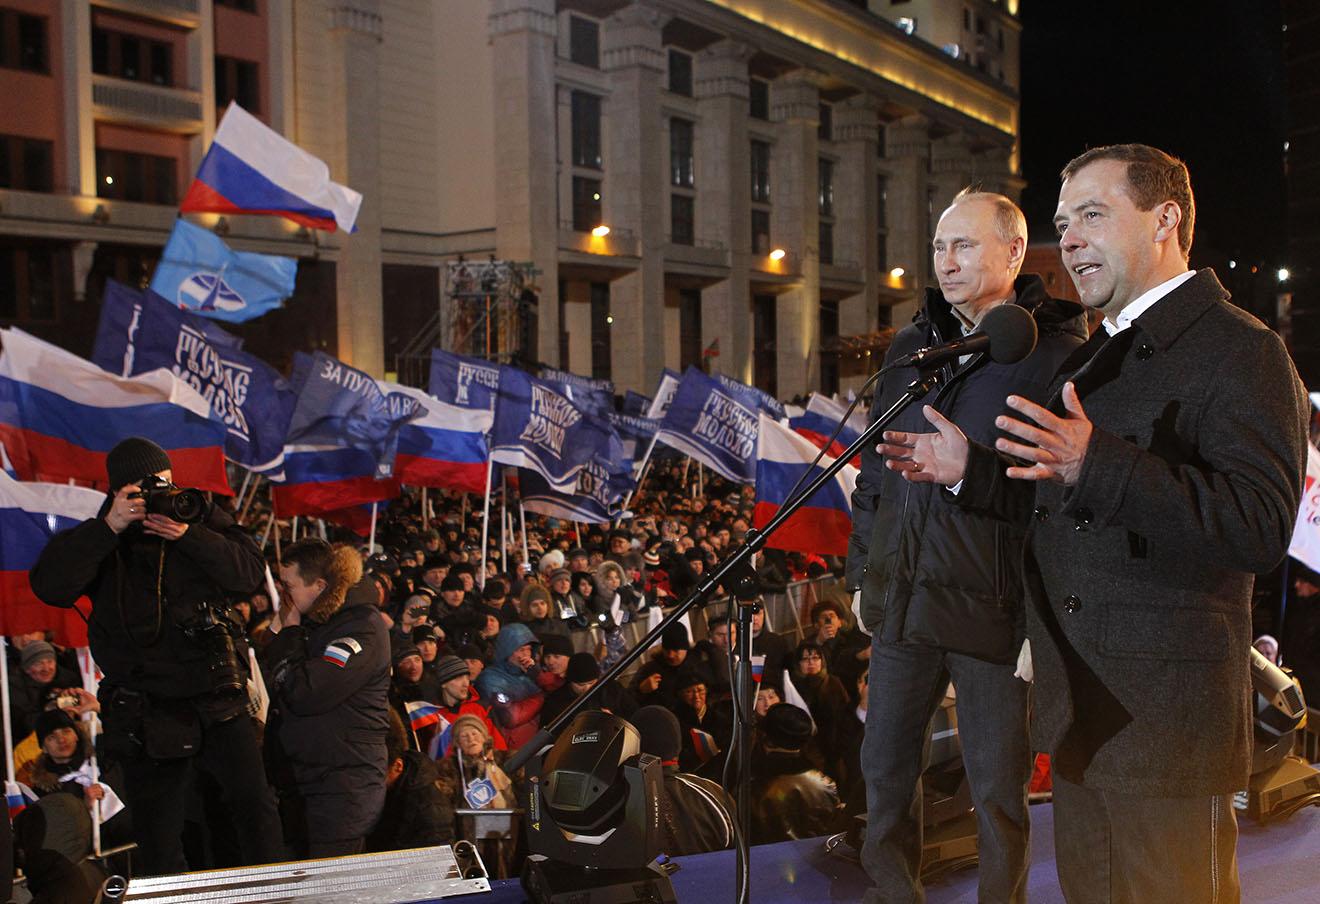 Владимир Путин и Дмитрий Медведев на Манежной площади, 2012 год. Фото: Дмитрий Астахов / ТАСС